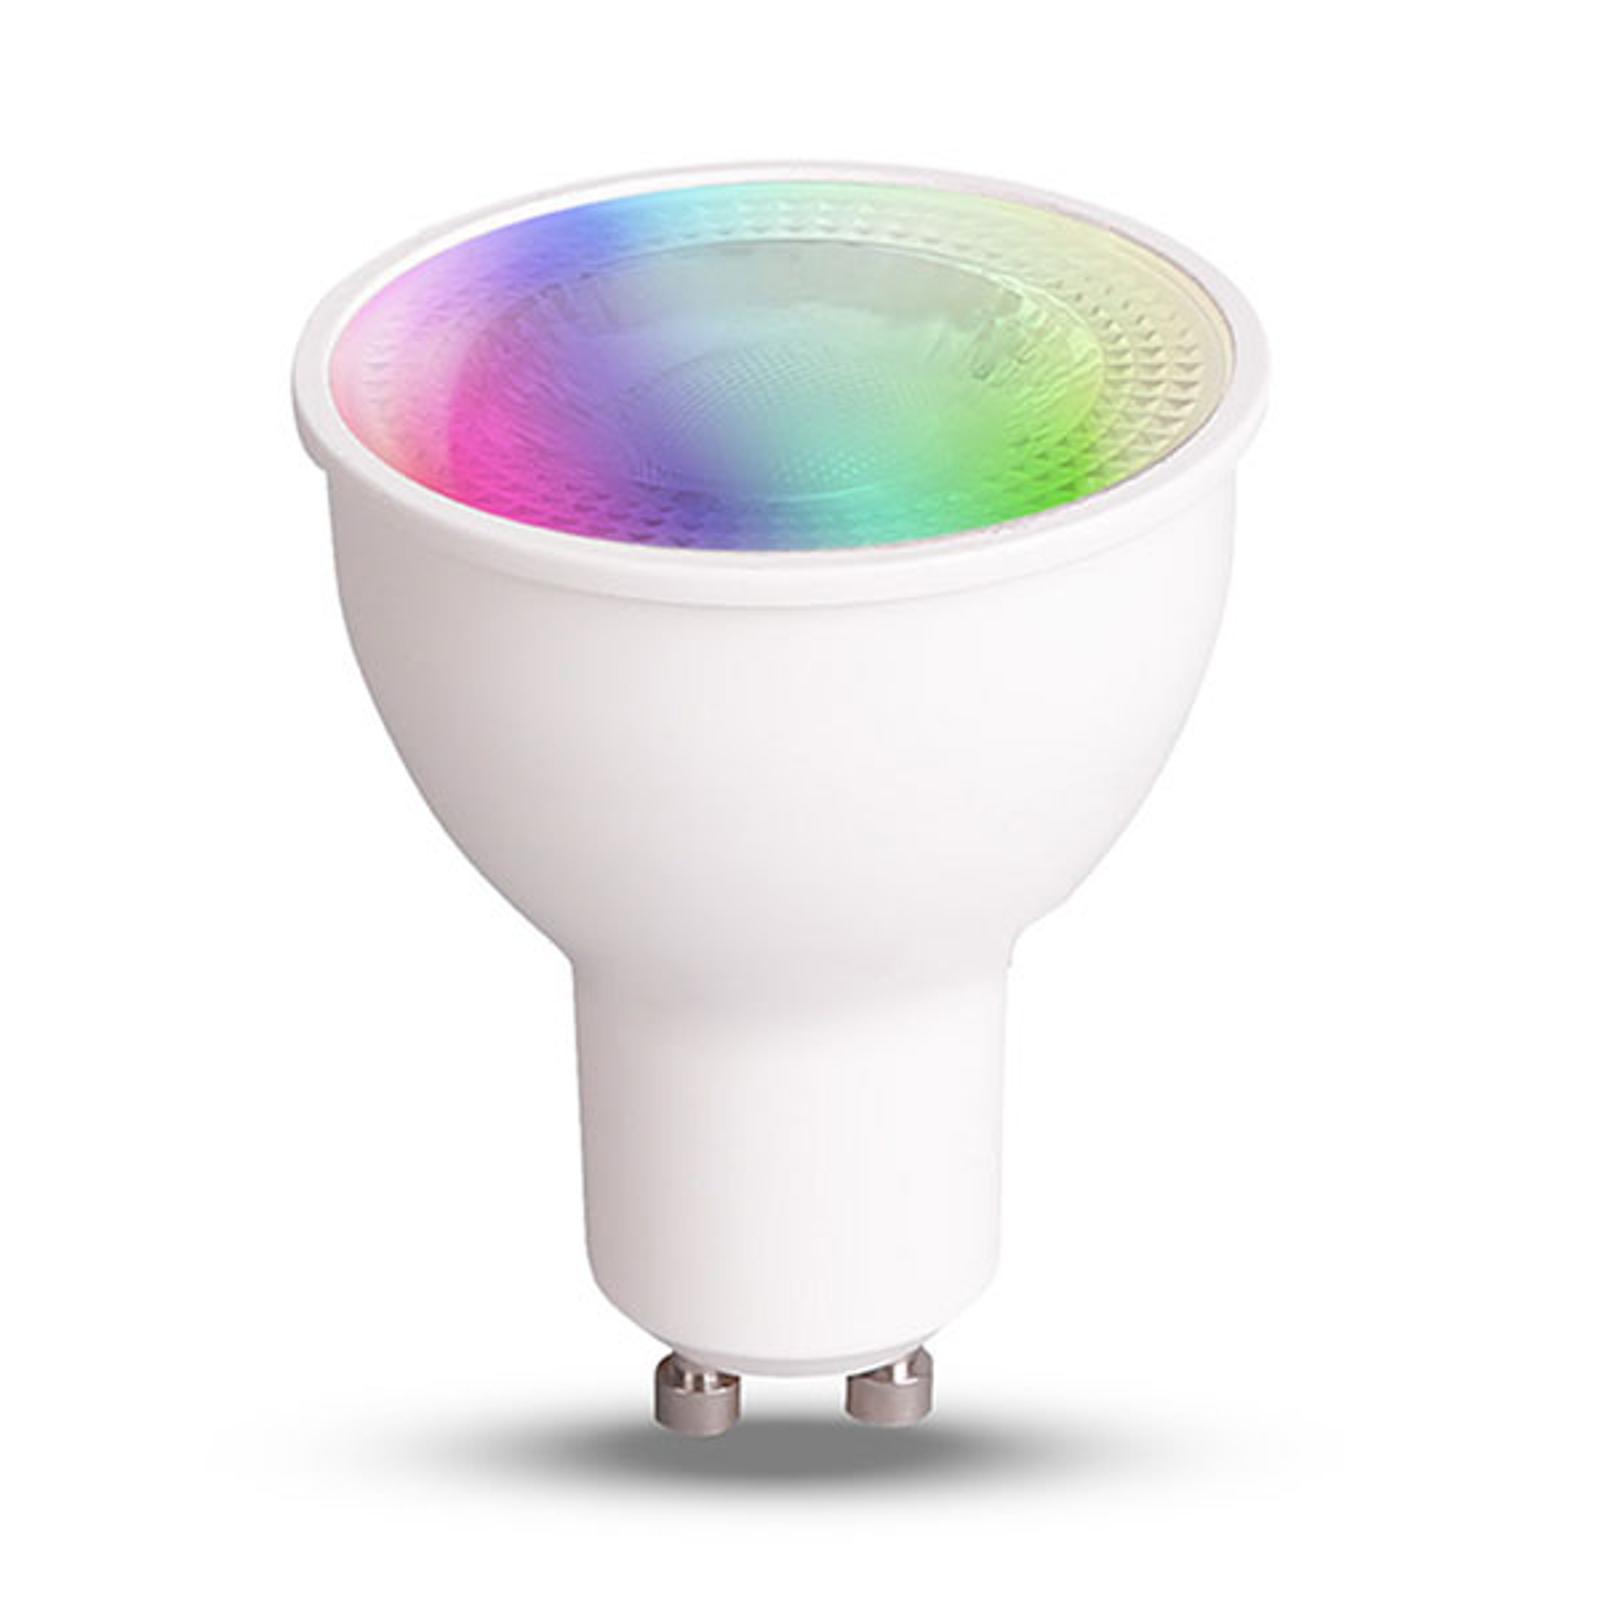 Müller Licht tint white+color LED GU10 6W 350 lm